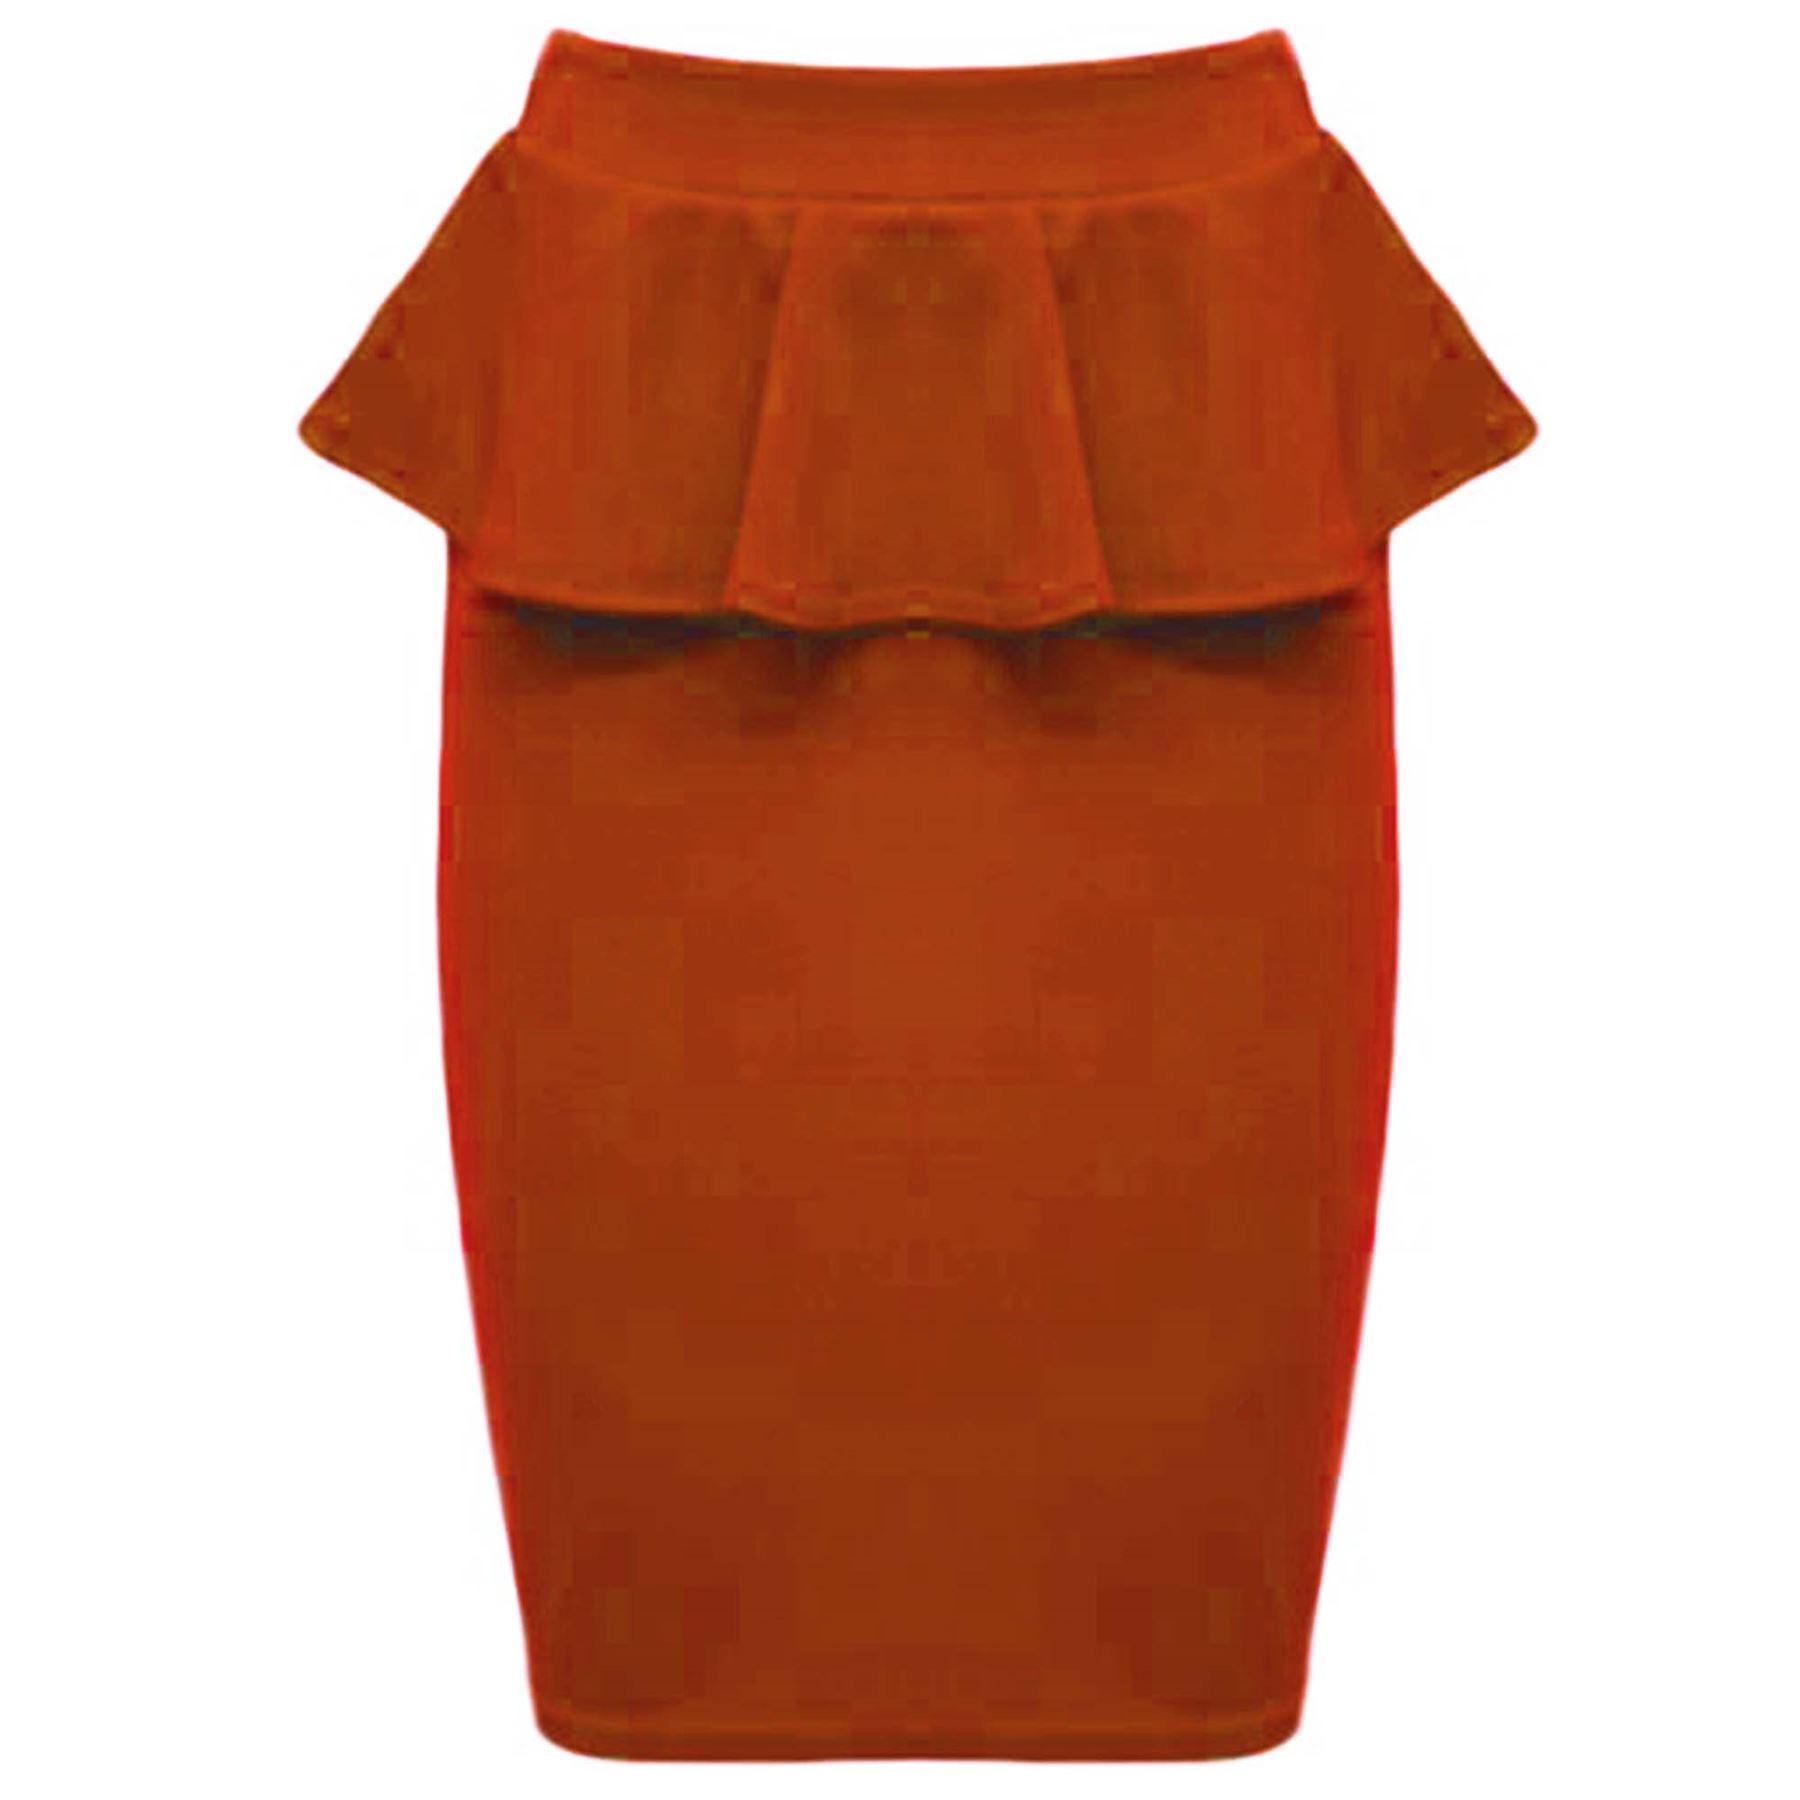 New Womens Ladies Fit Ponte Soft Bodycon Frill Peplum Pencil Stretch Midi Skirt